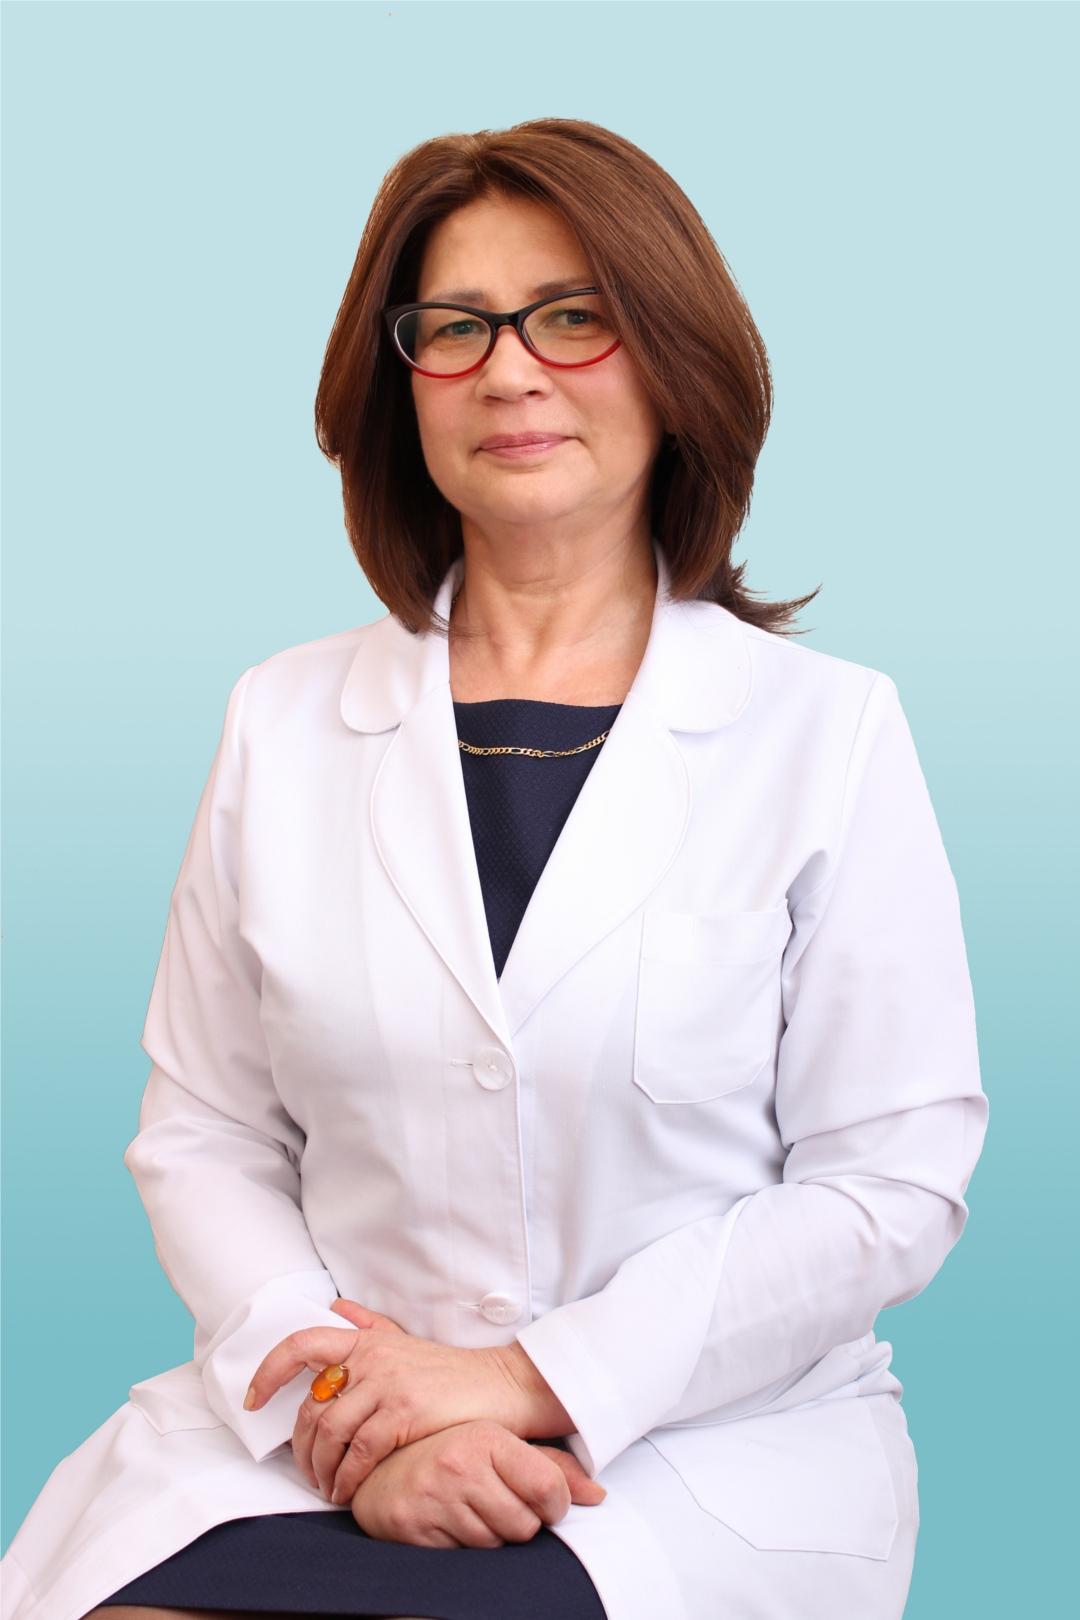 Врач акушер-гинеколог Орлова Ольга Анатольевна